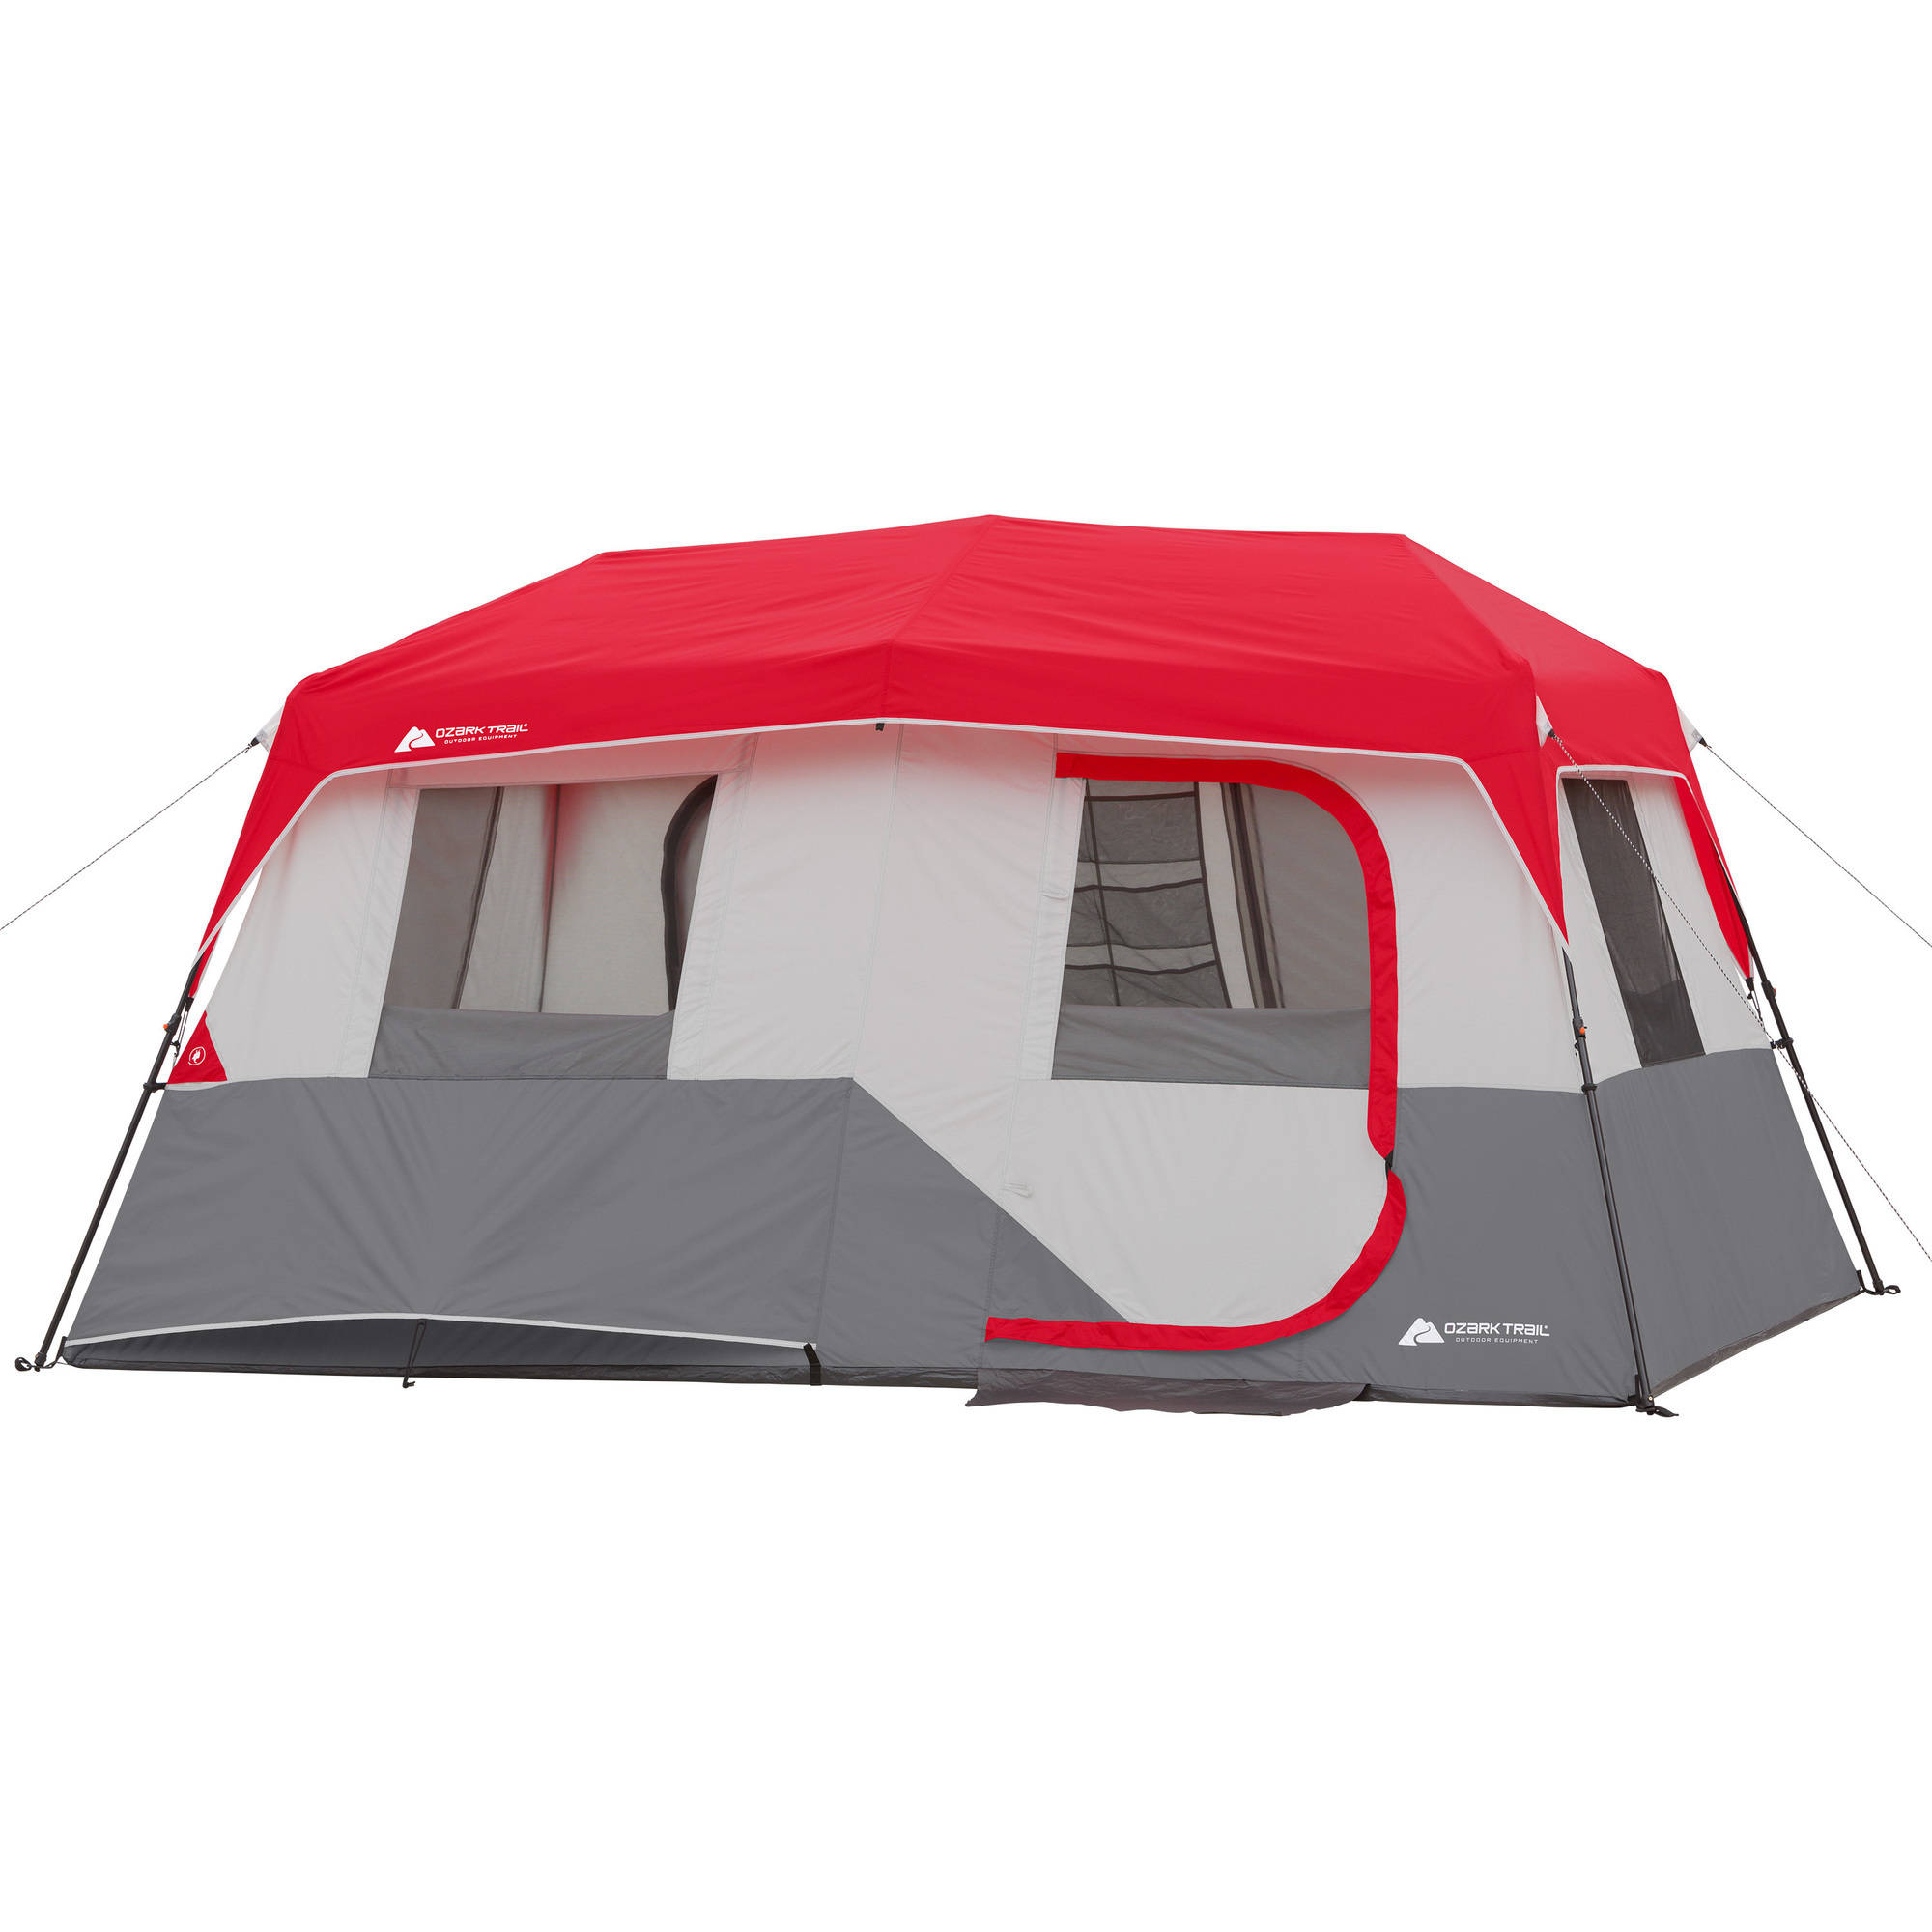 "Ozark Trail 13' x 9' x 72"" Instant Cabin Tent, Sleeps 8"